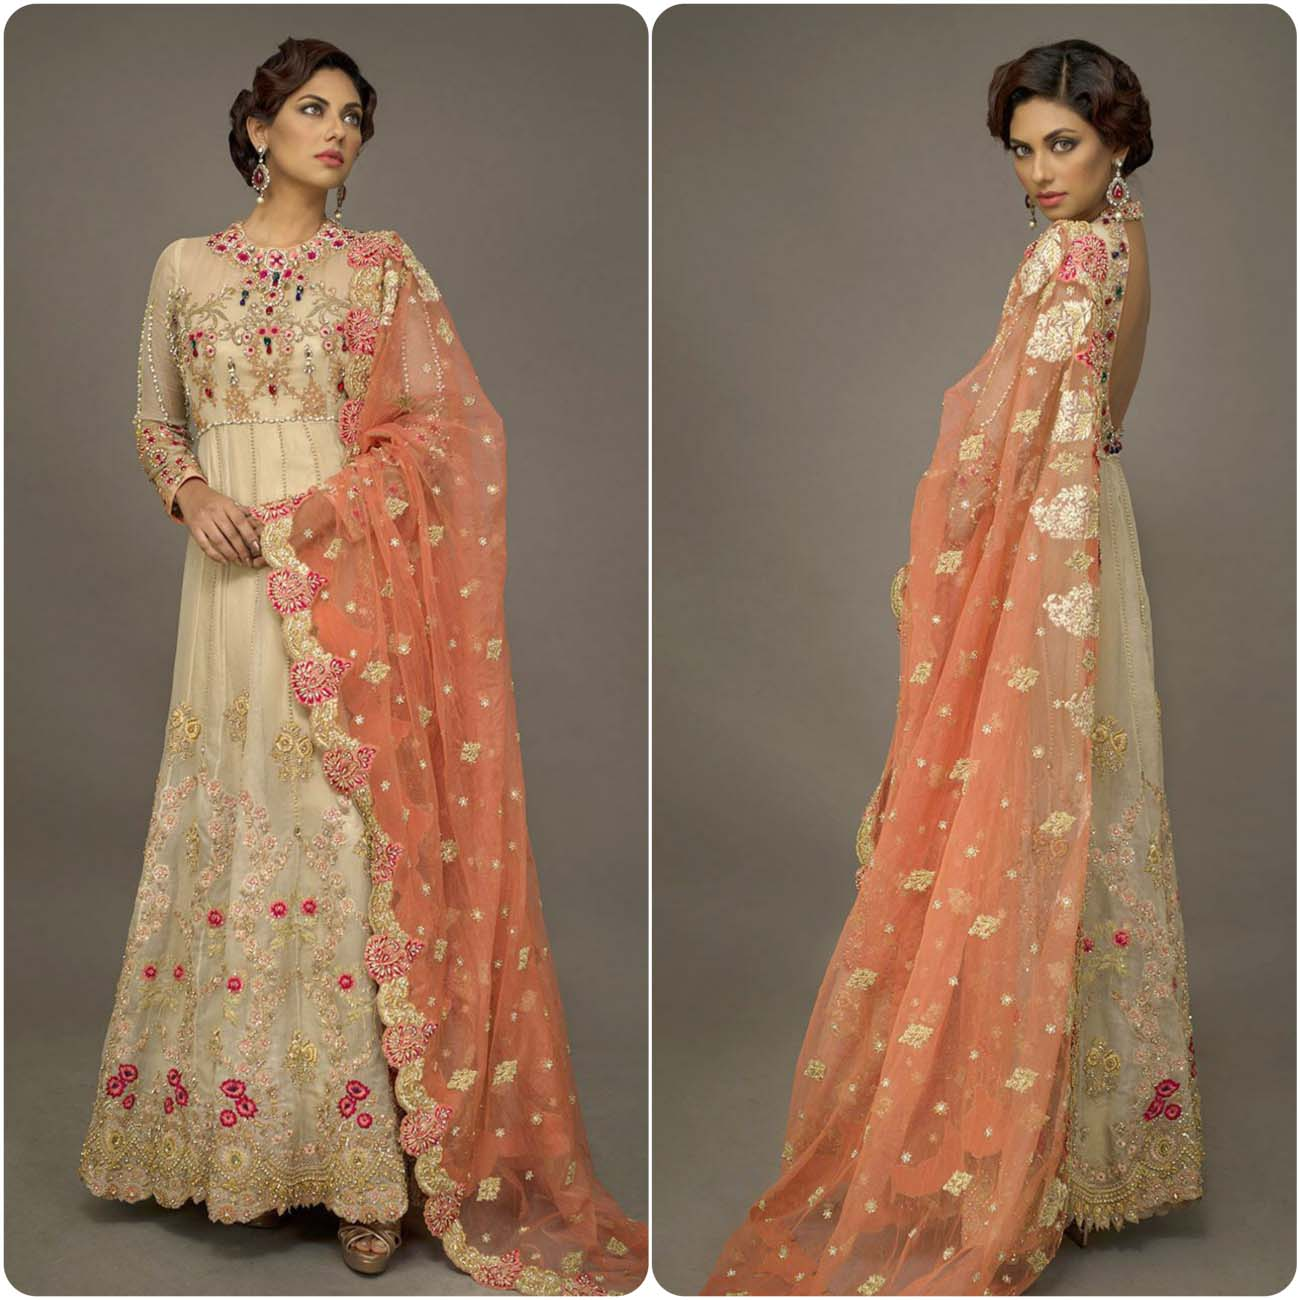 Deepak perwani Wedding Dresses Collection Fo Women 2016-2017...styloplanet (7)